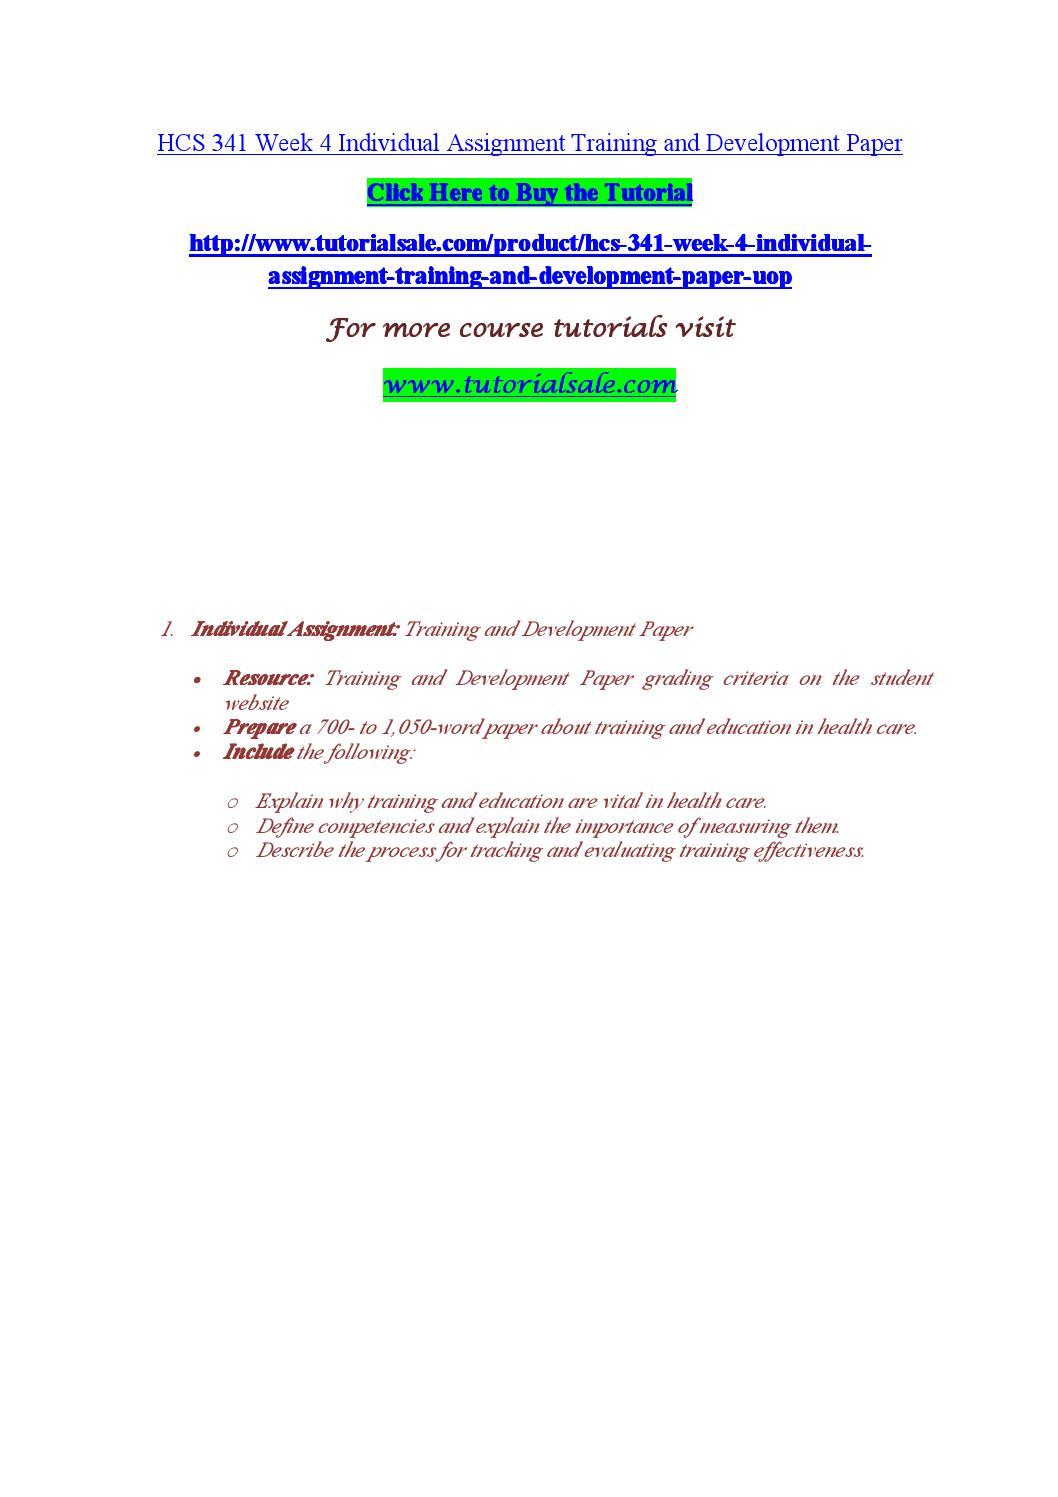 Sample on Training and Development